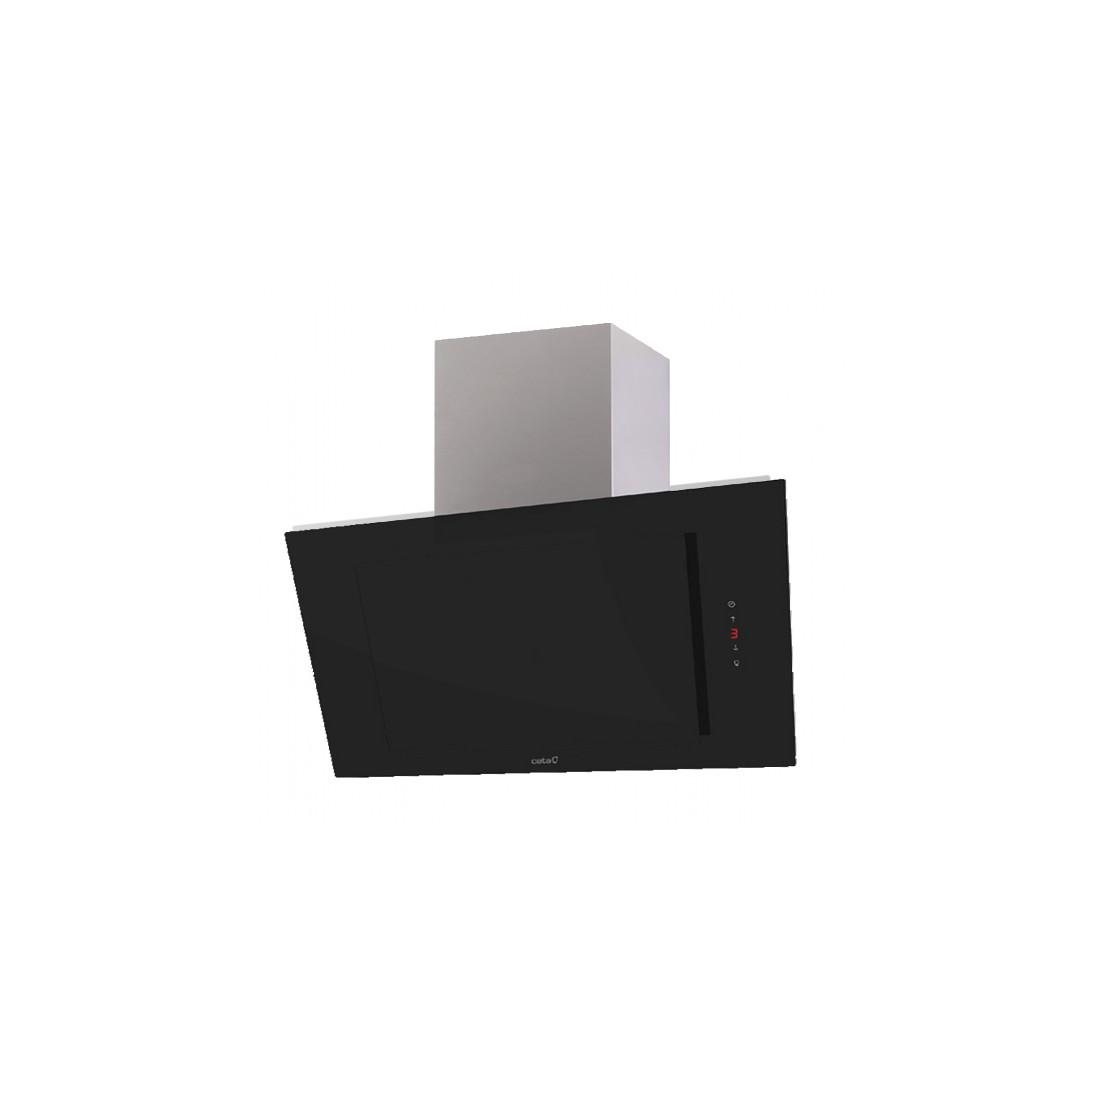 Campana Decorativa - Cata THALASSA 800XGBK Negro, 80 cm